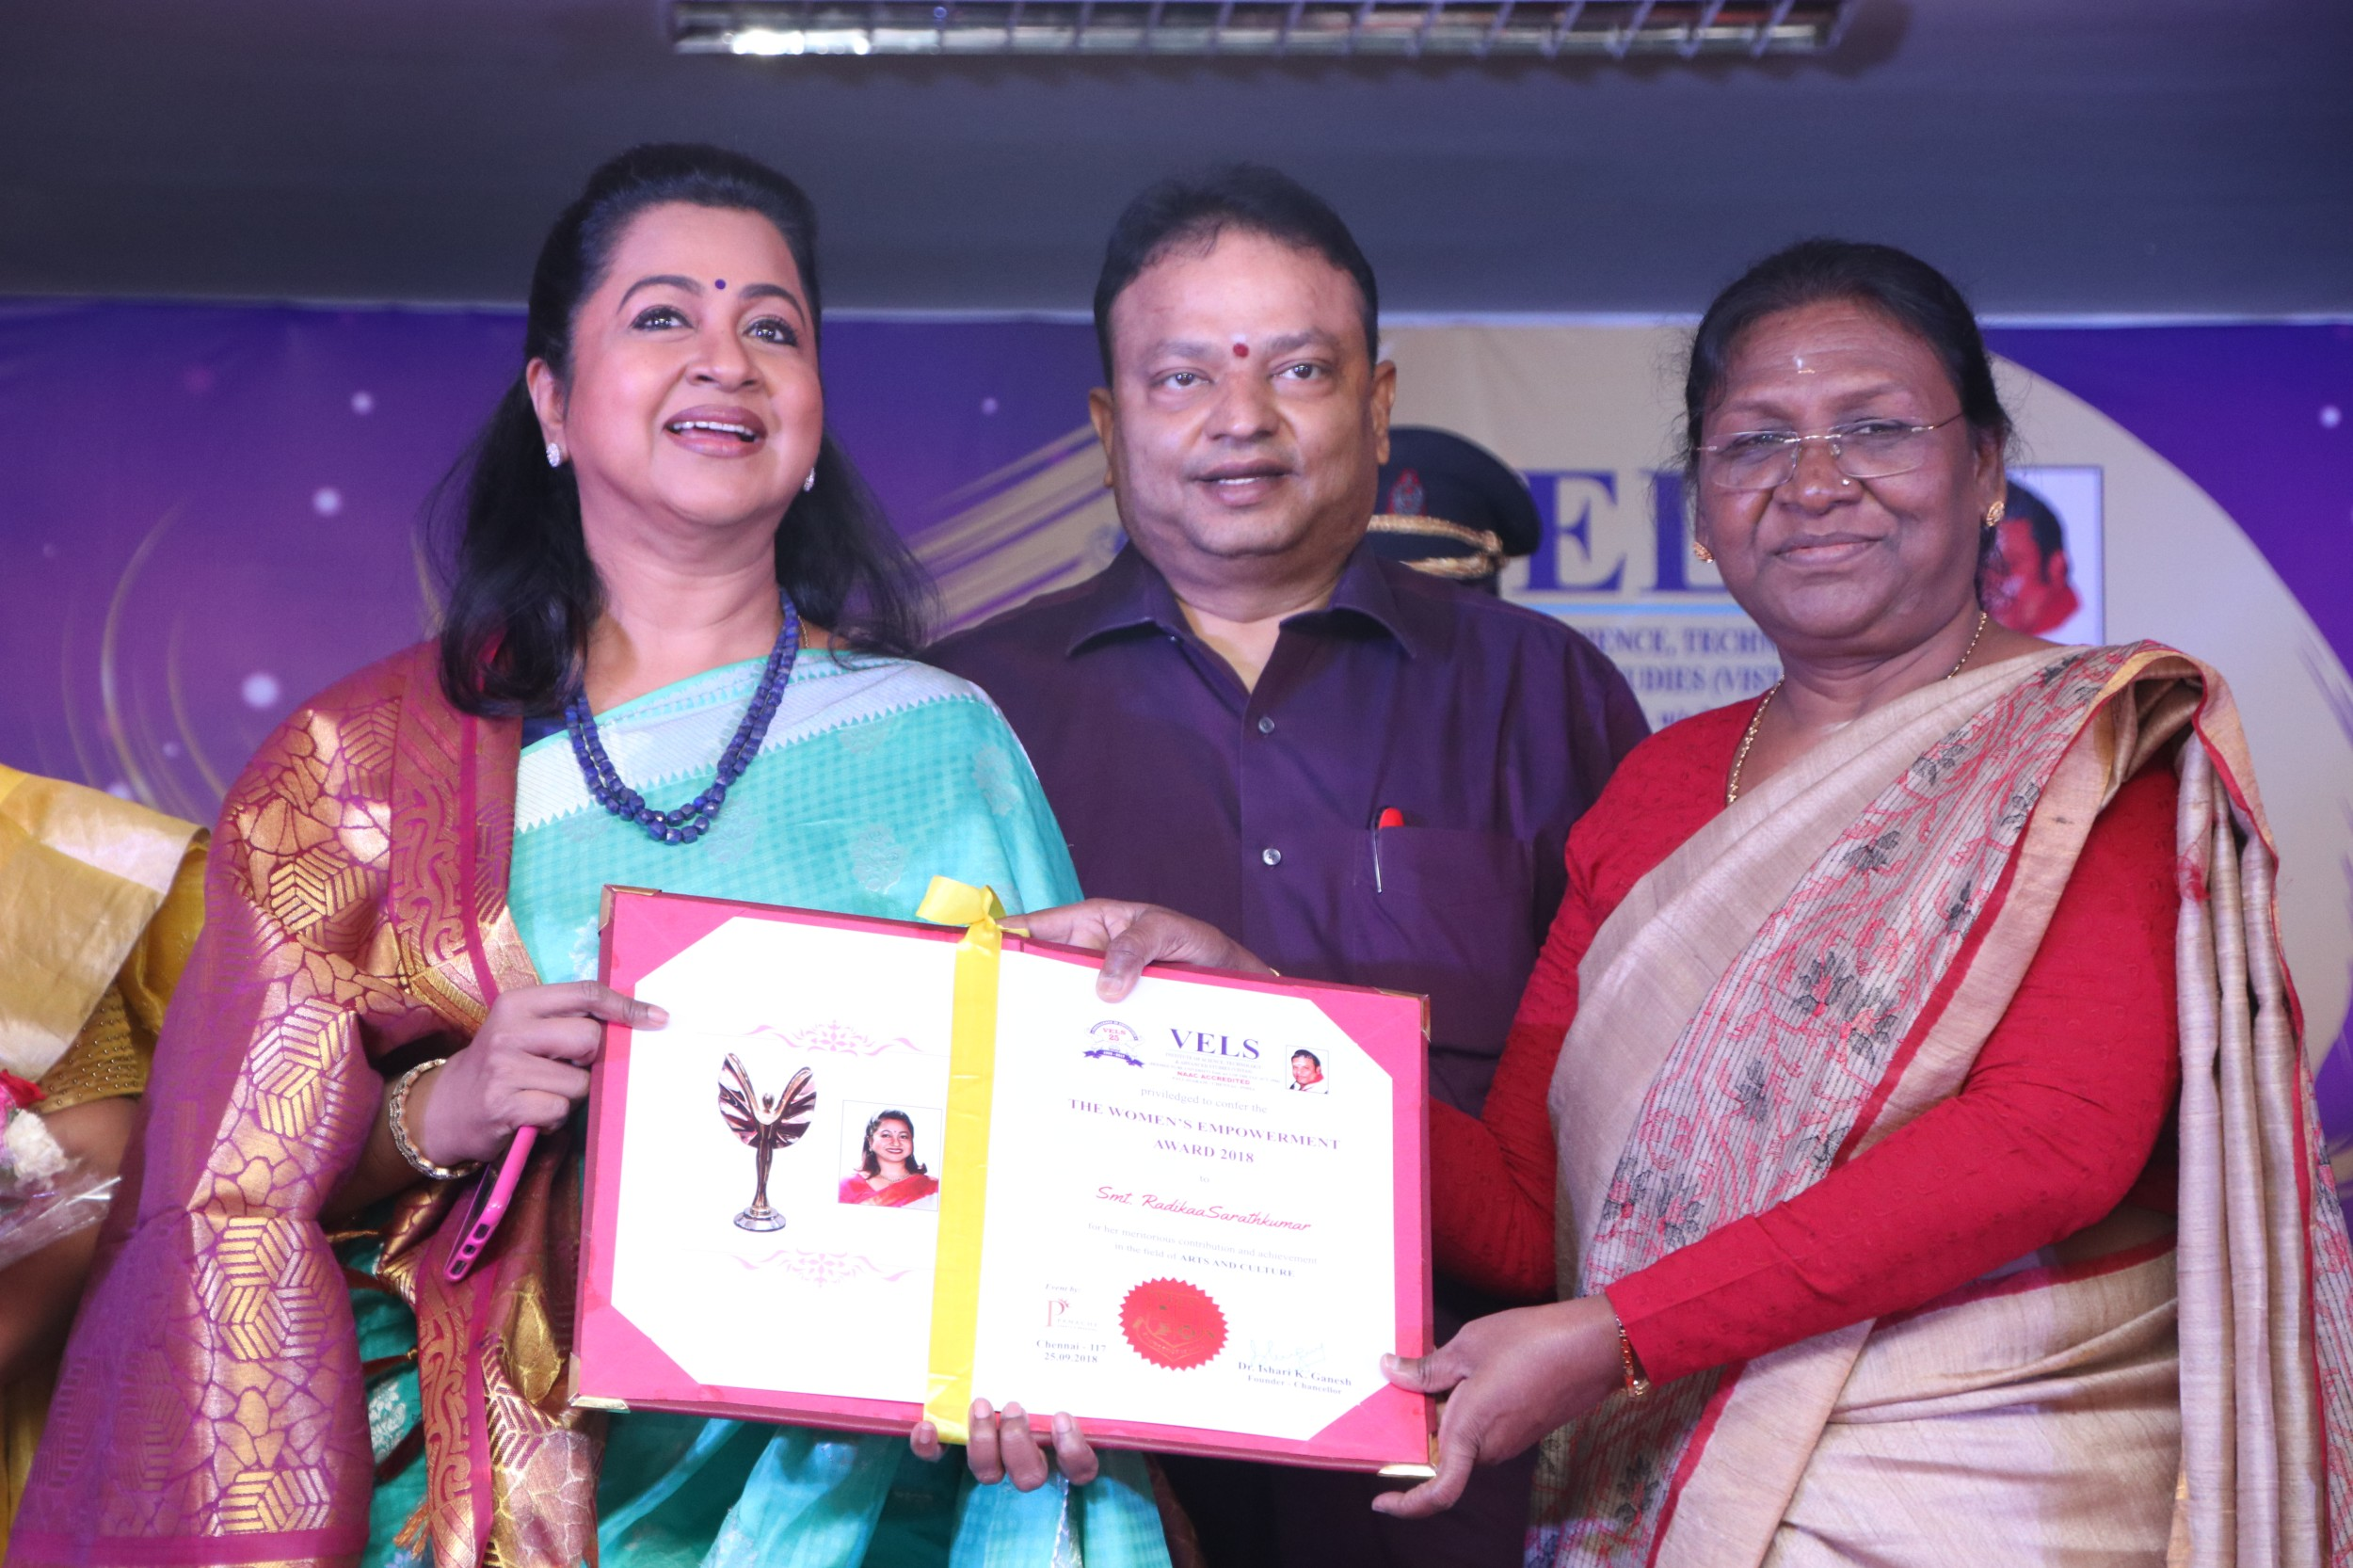 """ Vels university Panache Events & Branding –  The Womens Empowerment Award 2018."